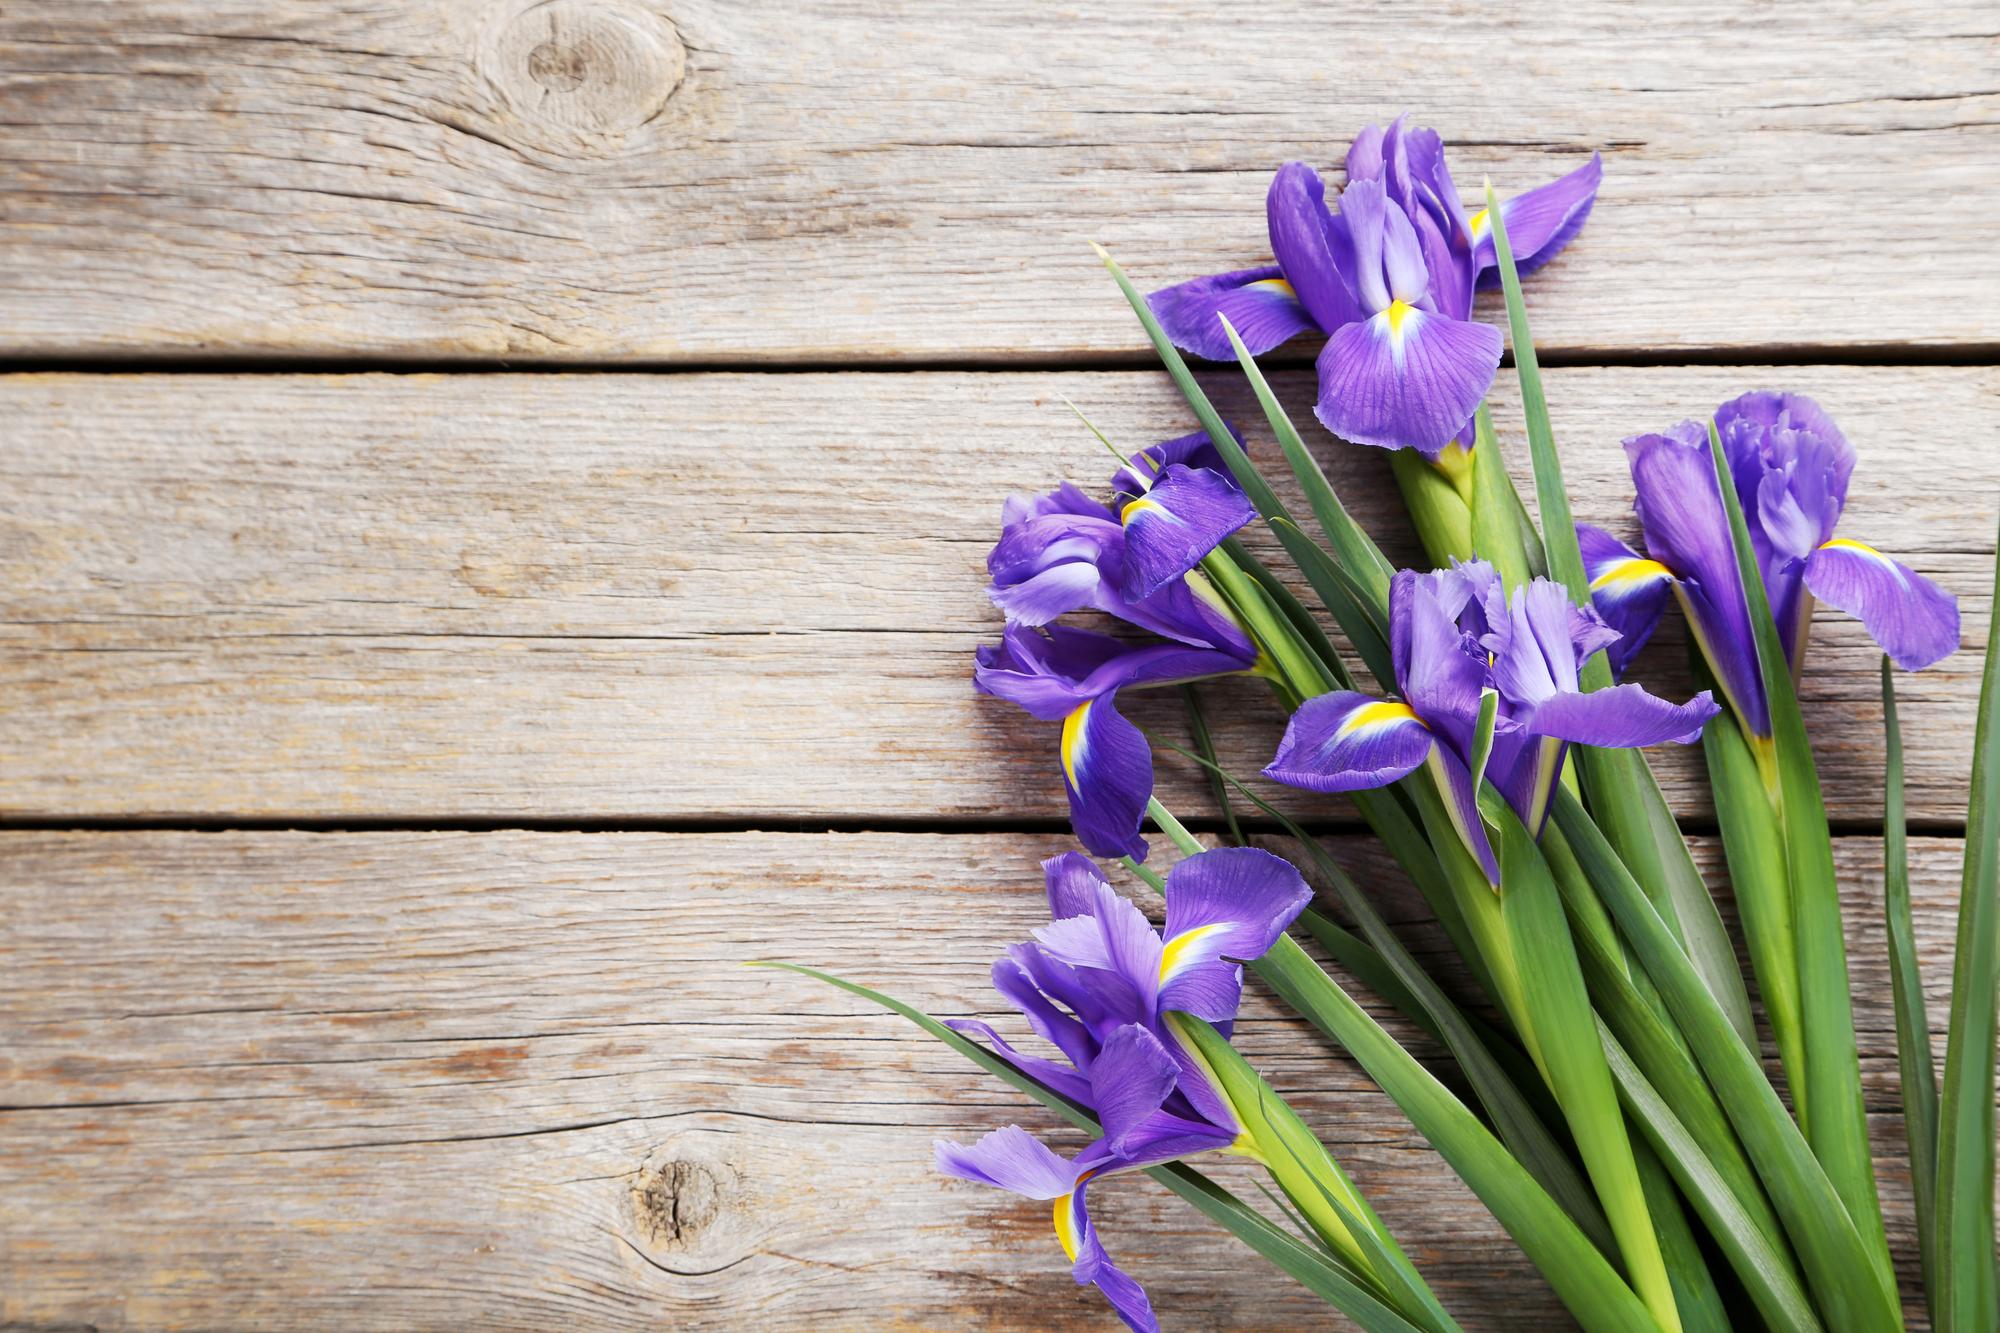 Bouquet Of Iris Flowers On Grey Wooden Table Tamara Raphaeli